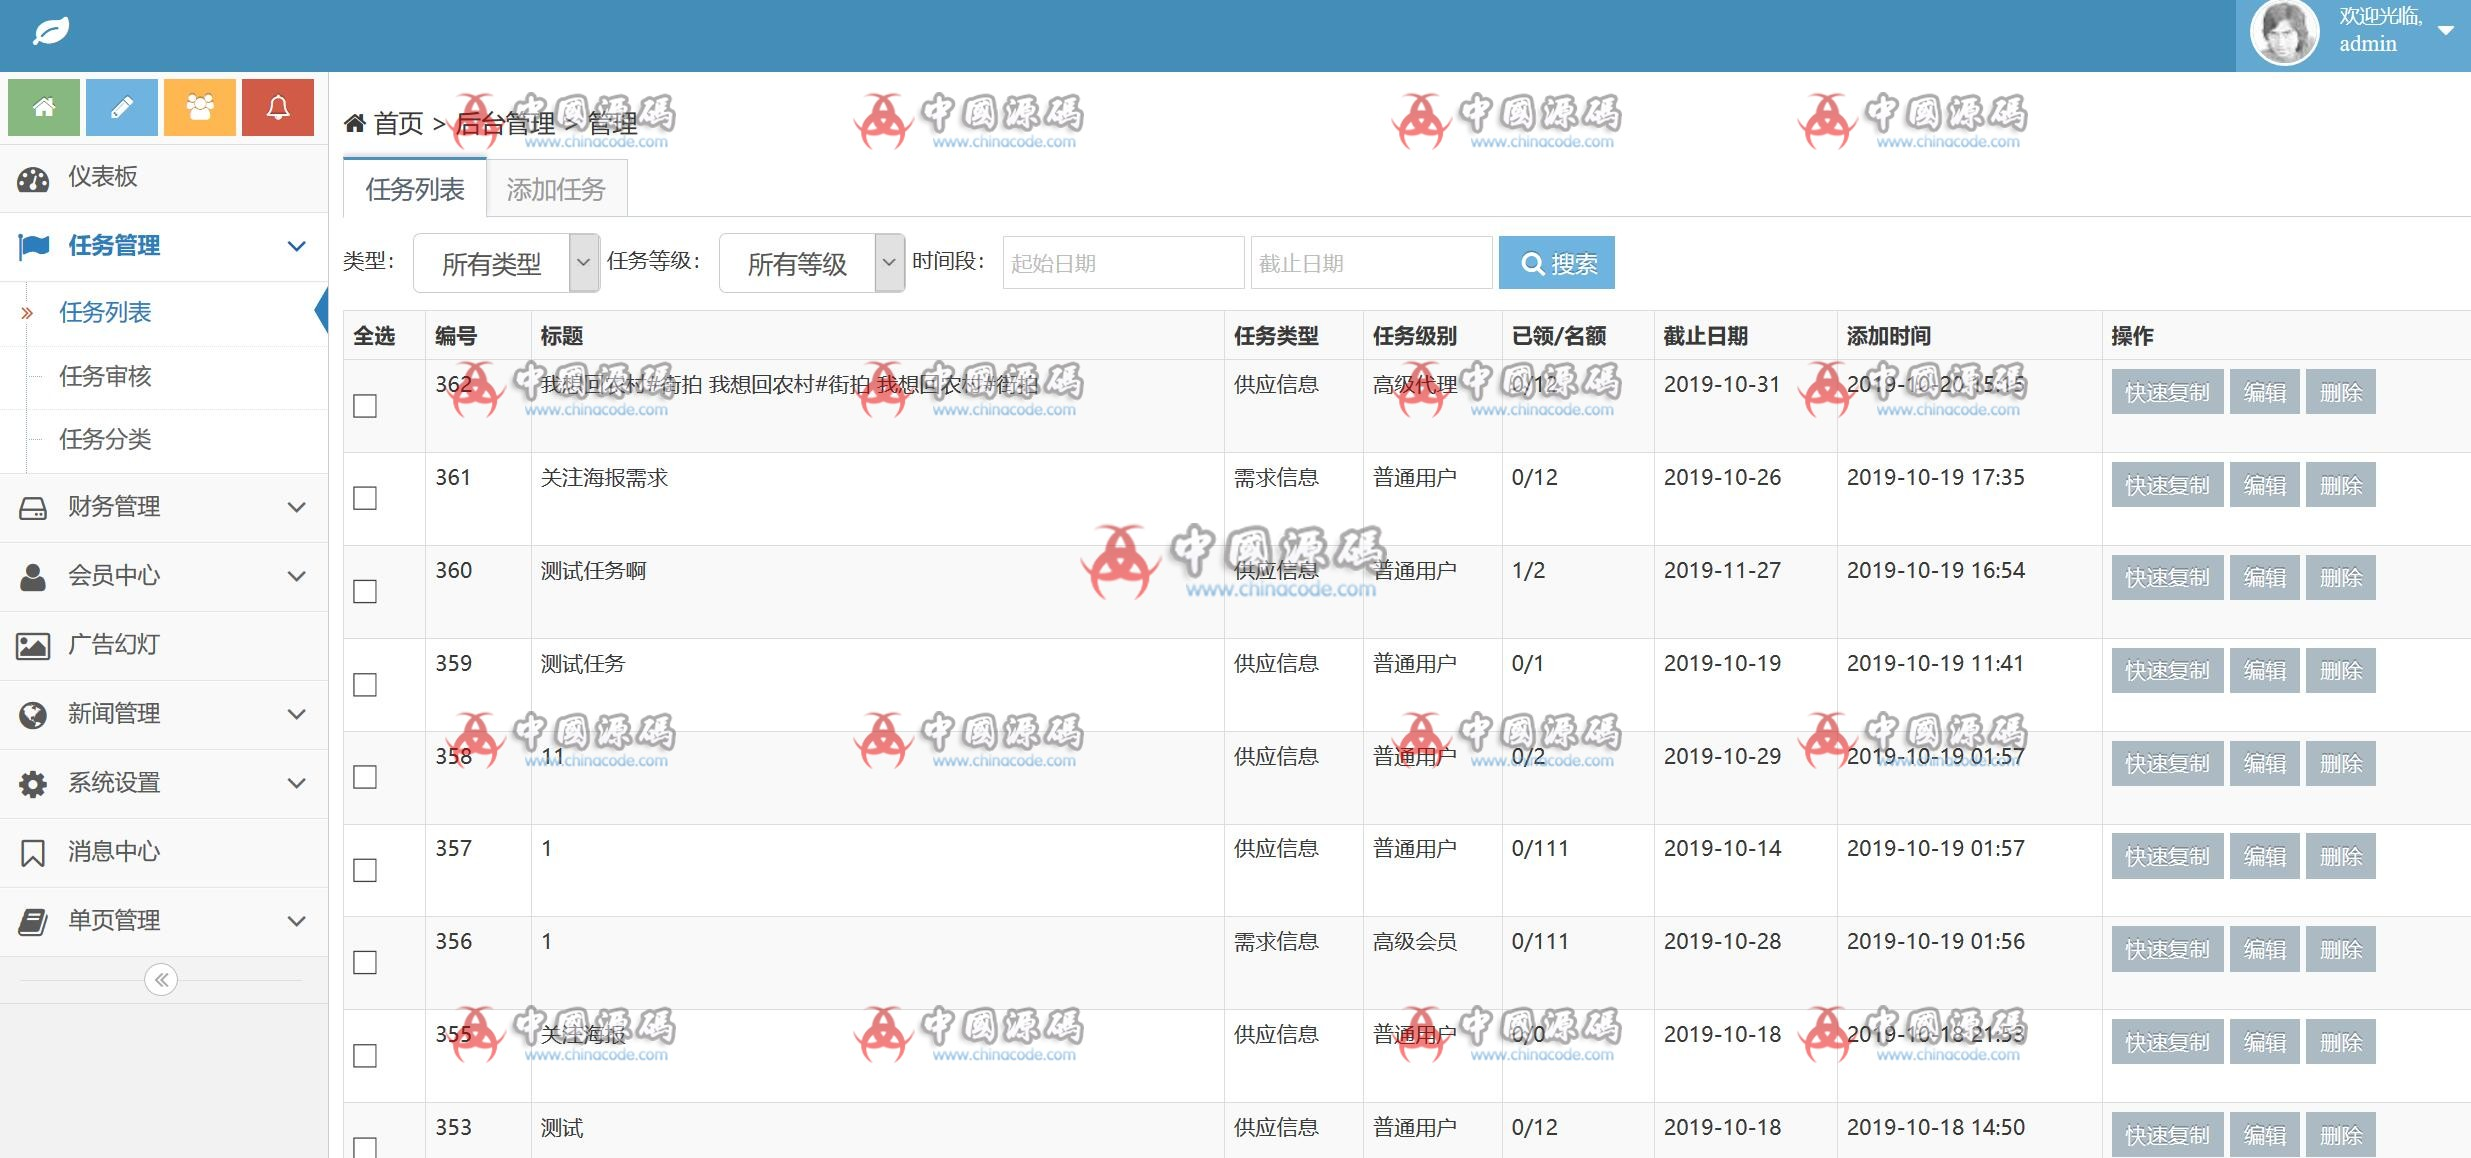 THINKPHP抖音全新任务抢单源码下载,多用户旧版、新版两个UI界面 H5-第9张